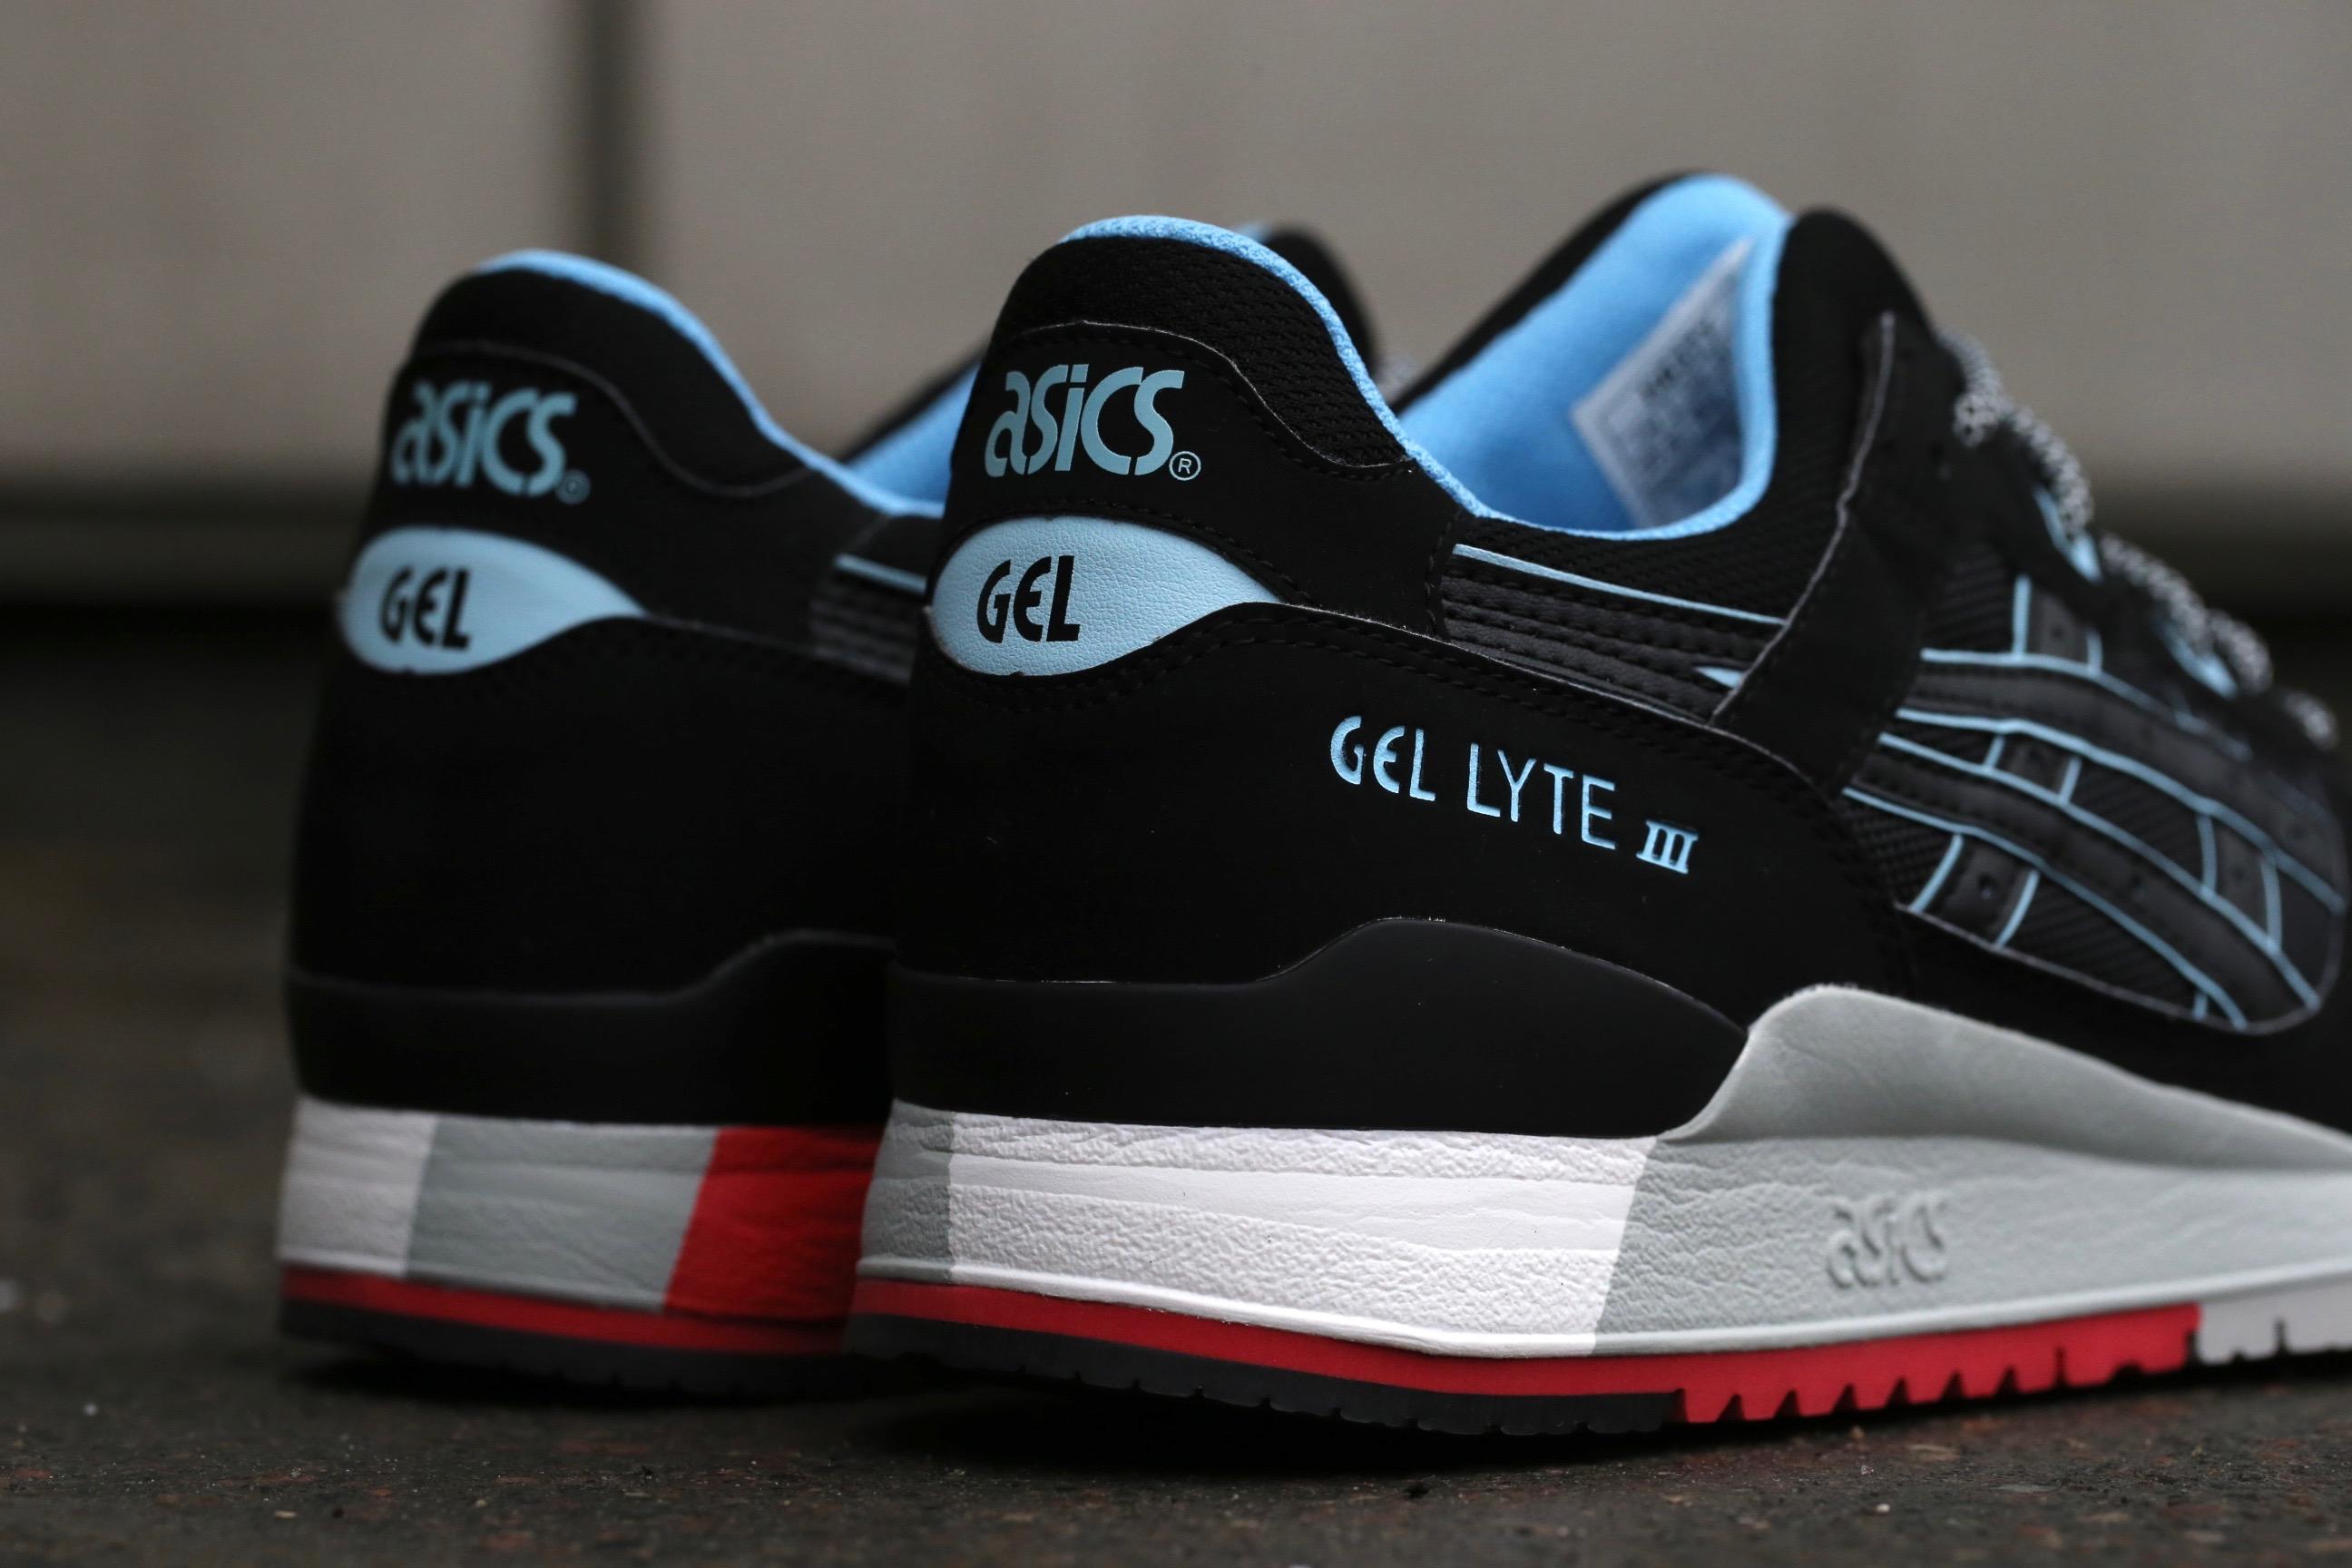 Buy asics gel lyte iii black black \u003e Up